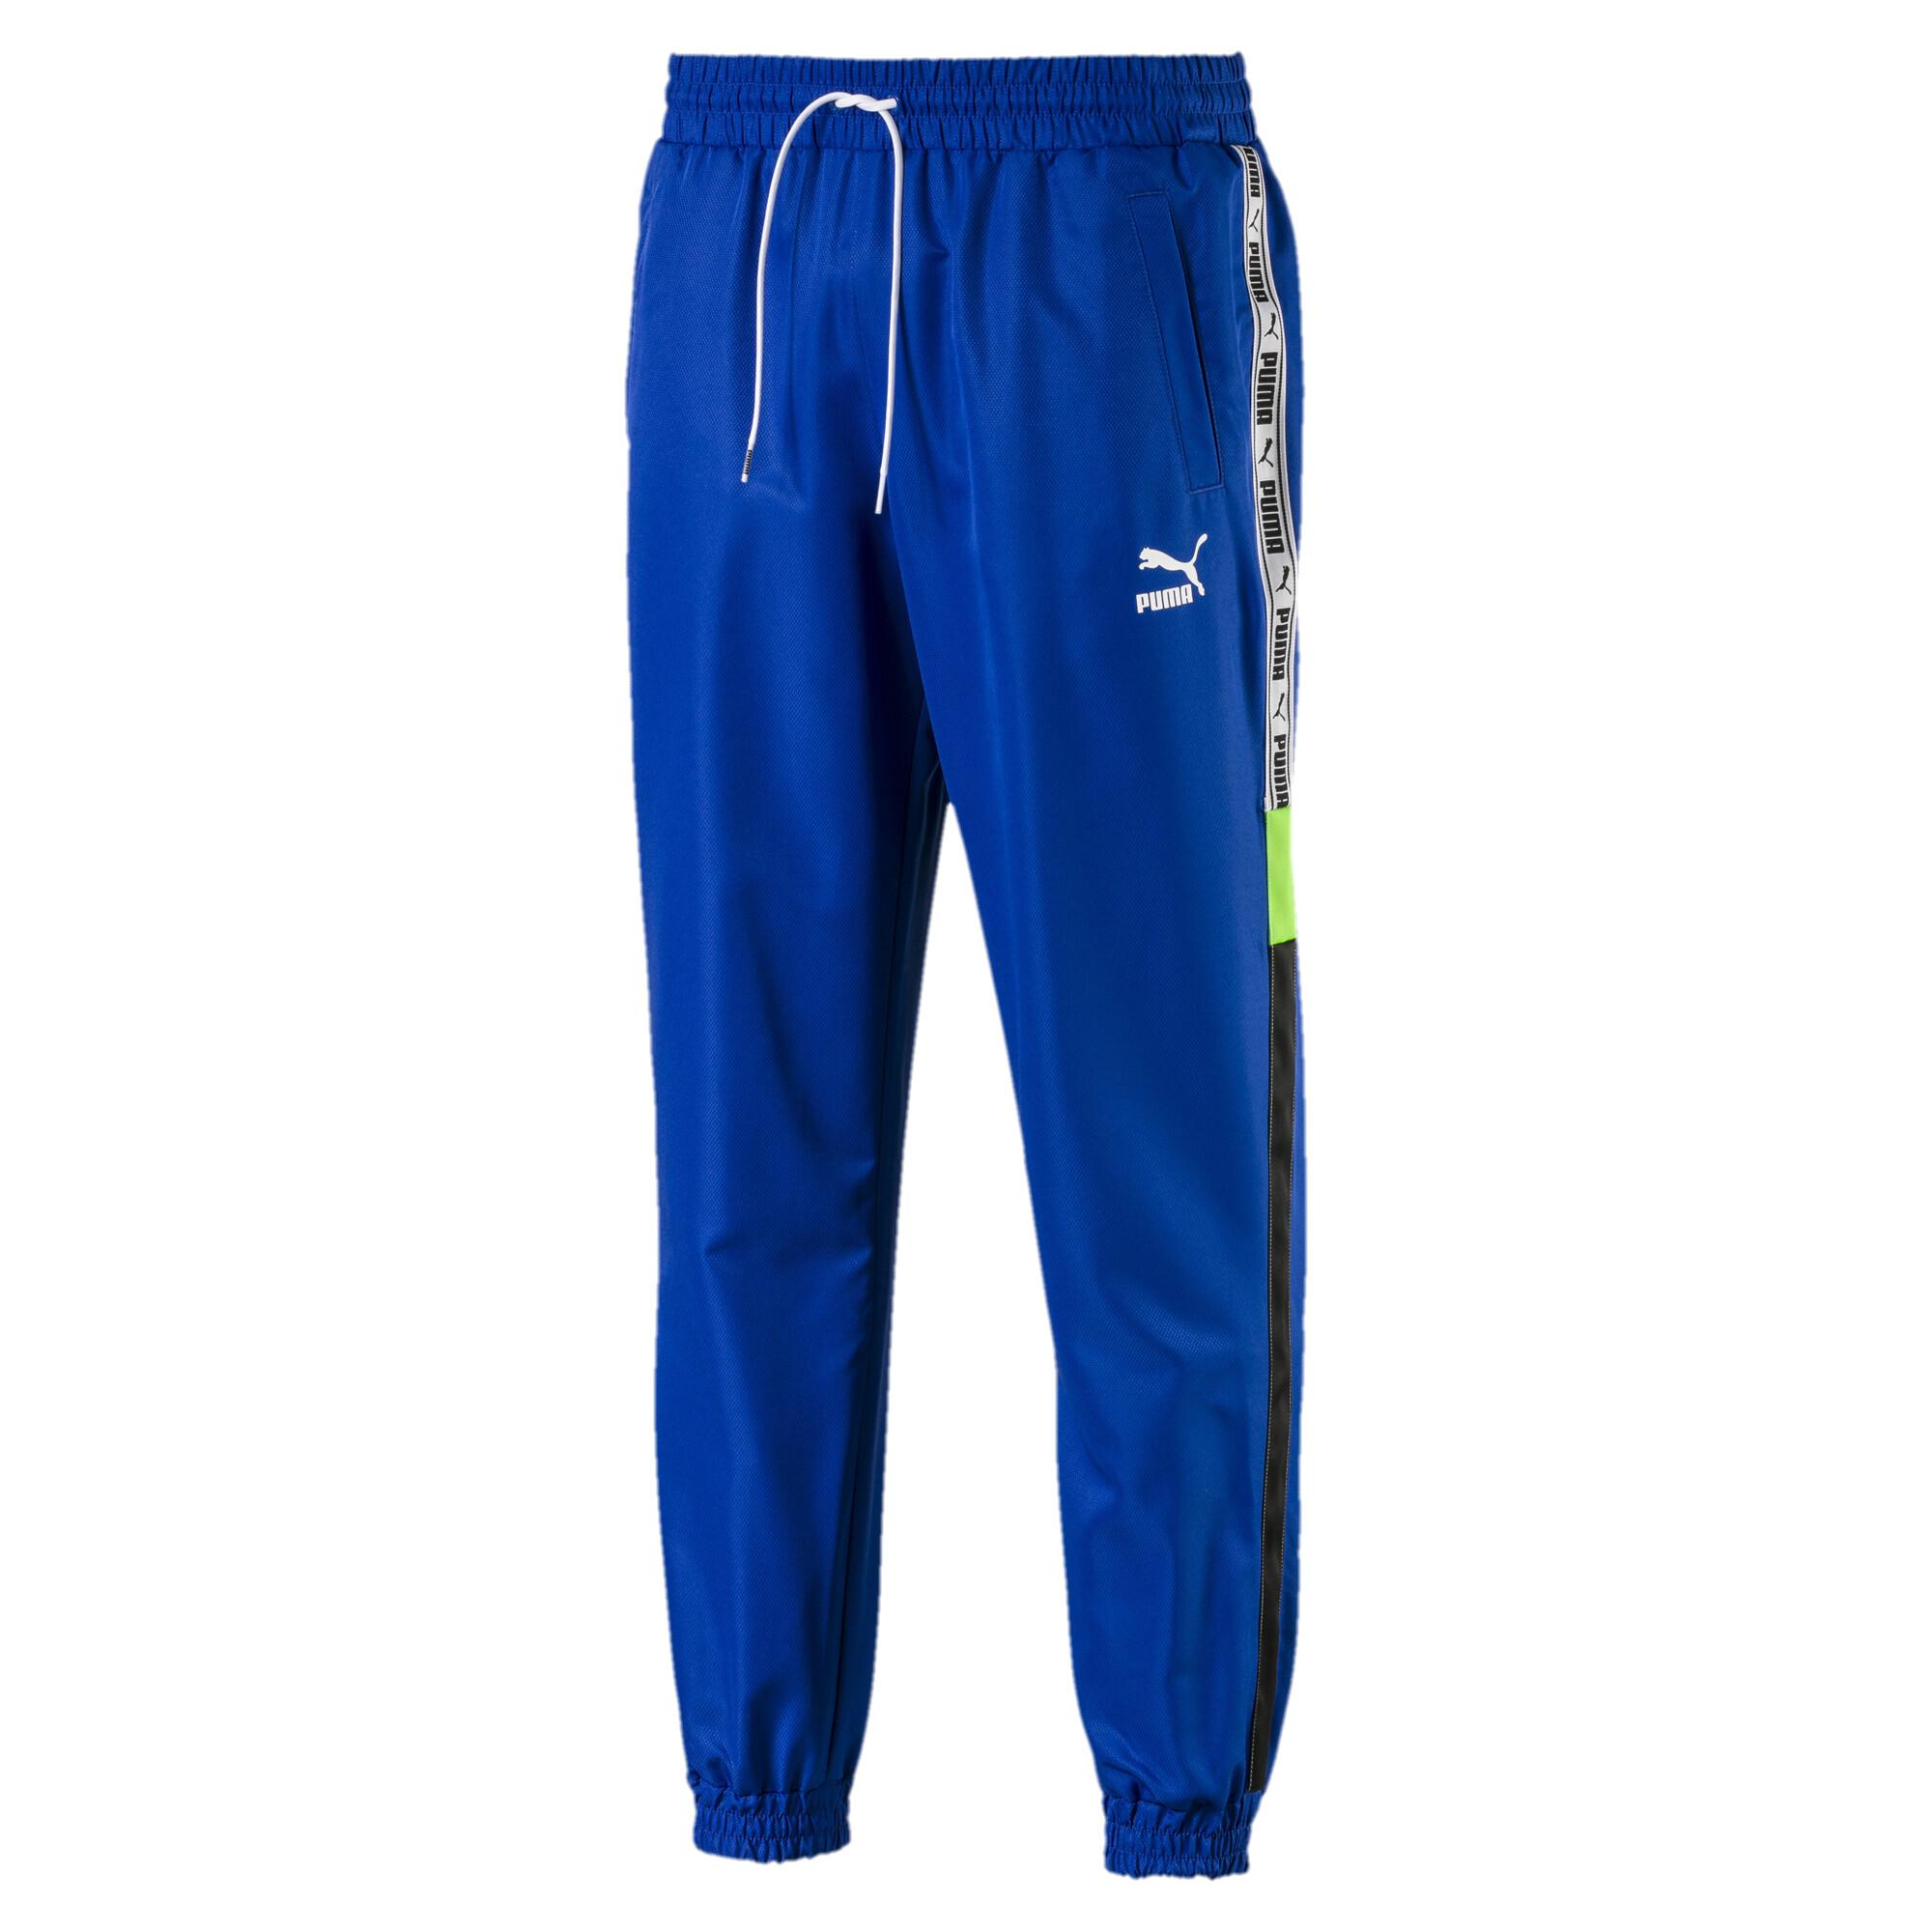 Image Puma XTG Woven Men's Track Pants #4